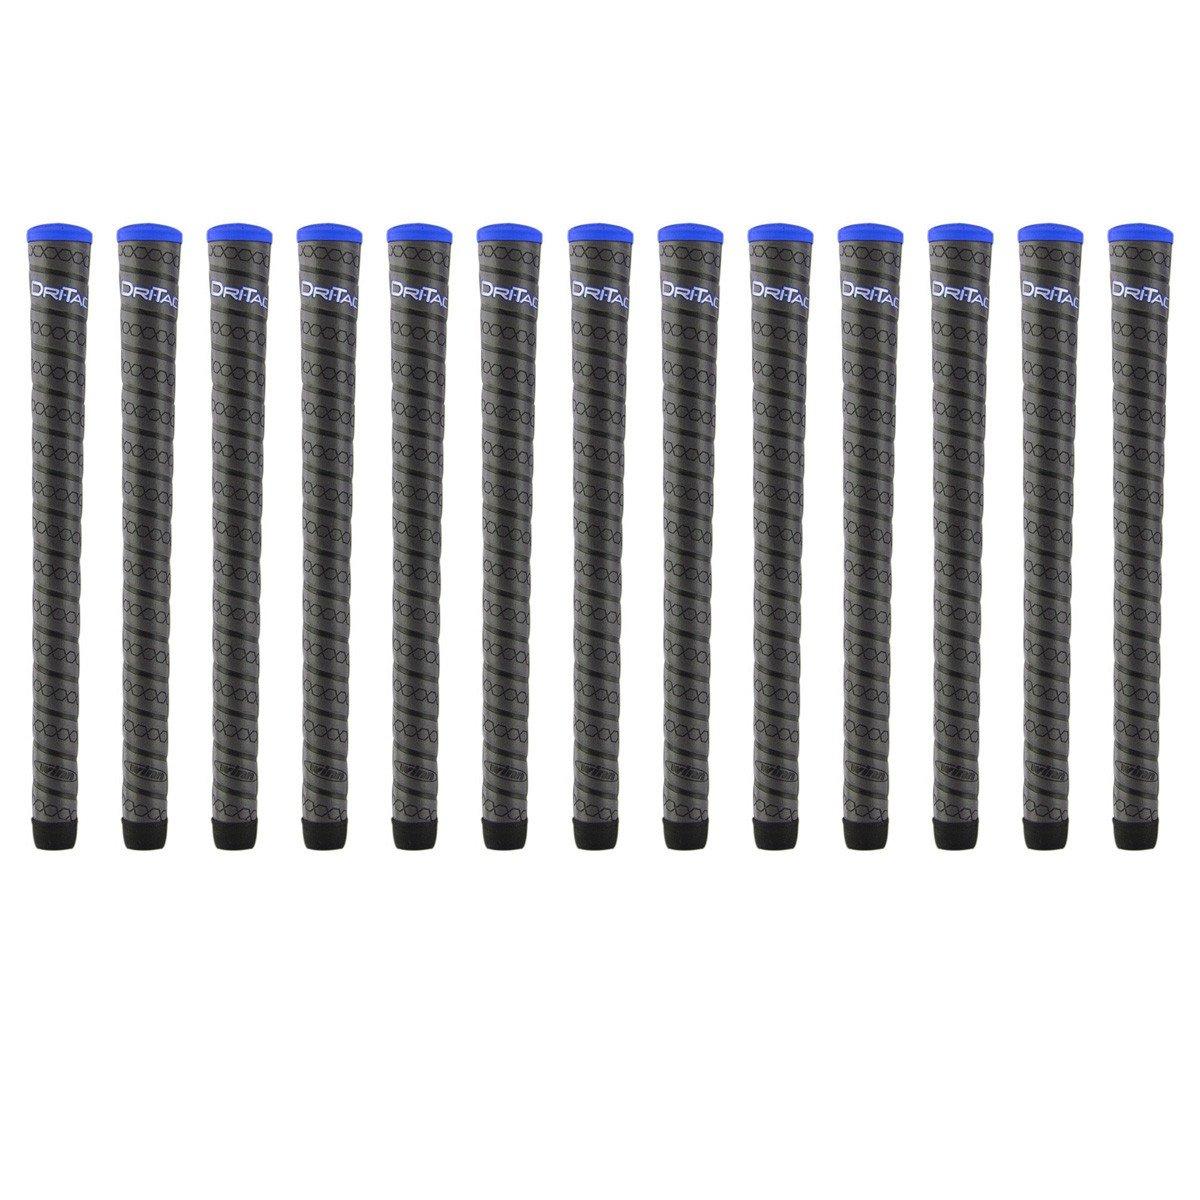 Winn dri-tacラップMidsize (+ 1 / 16インチ) 13 Pieceゴルフグリップバンドル( B01C7HQKWK